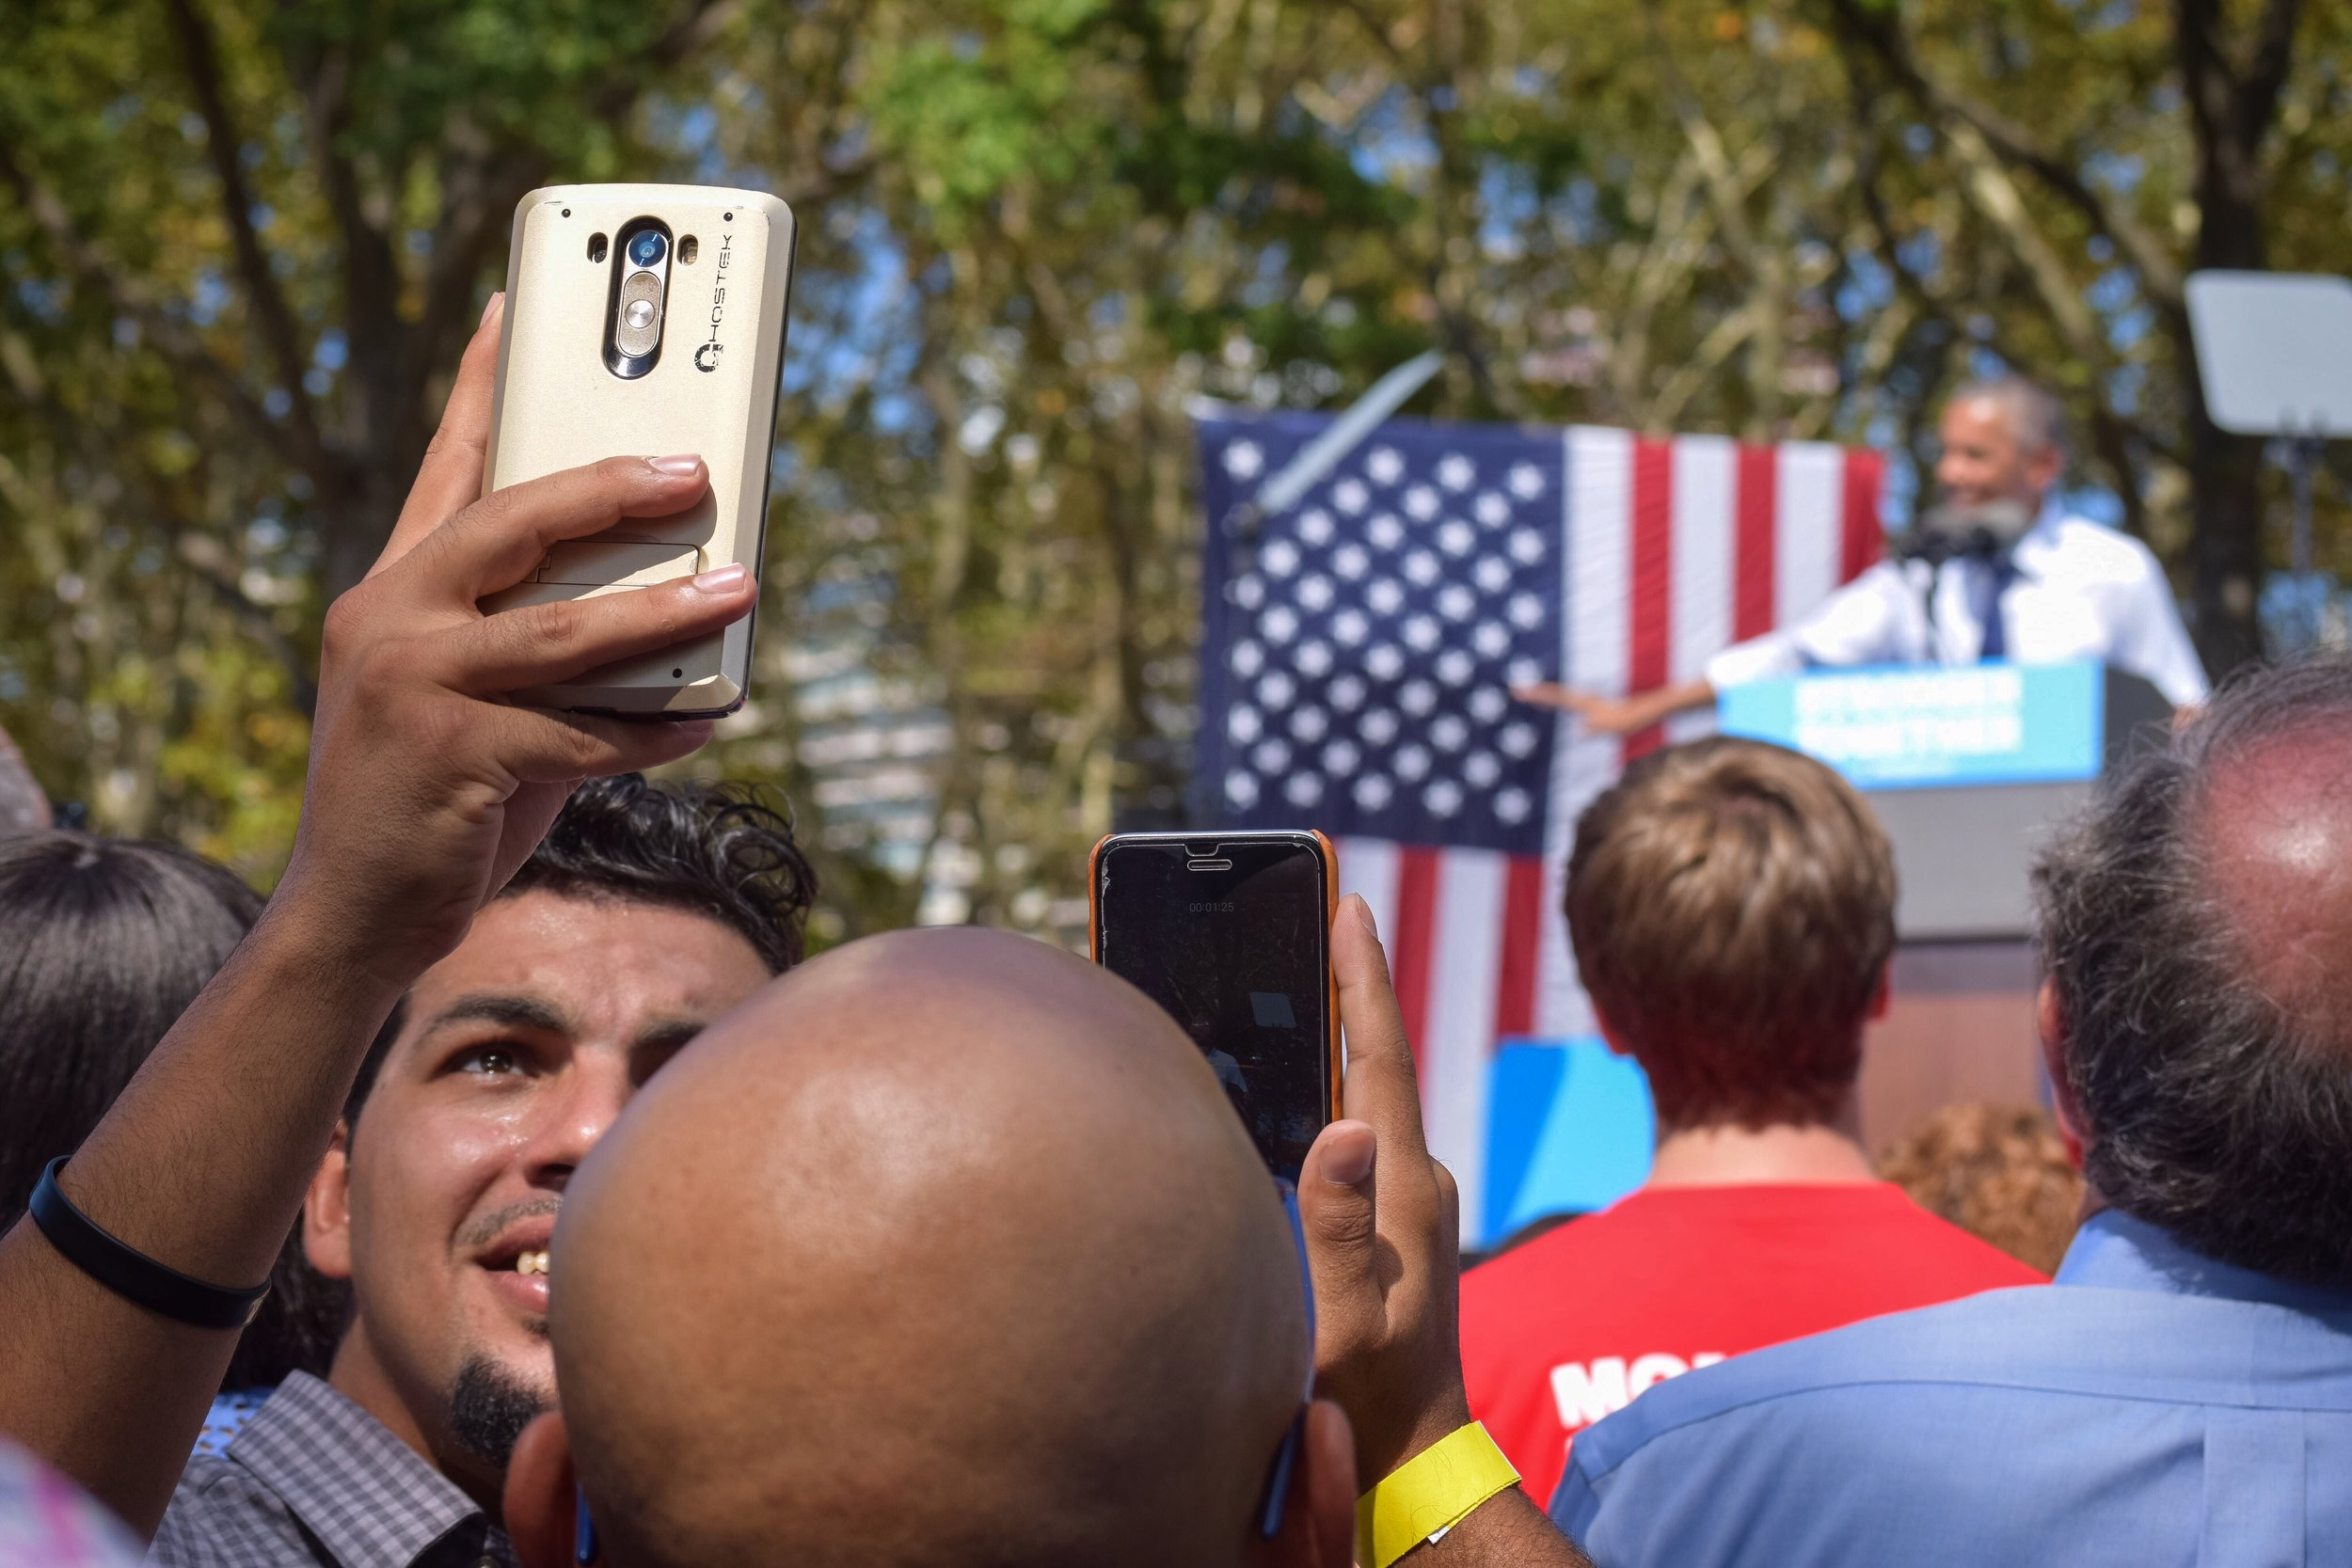 Mid-speech selfie.